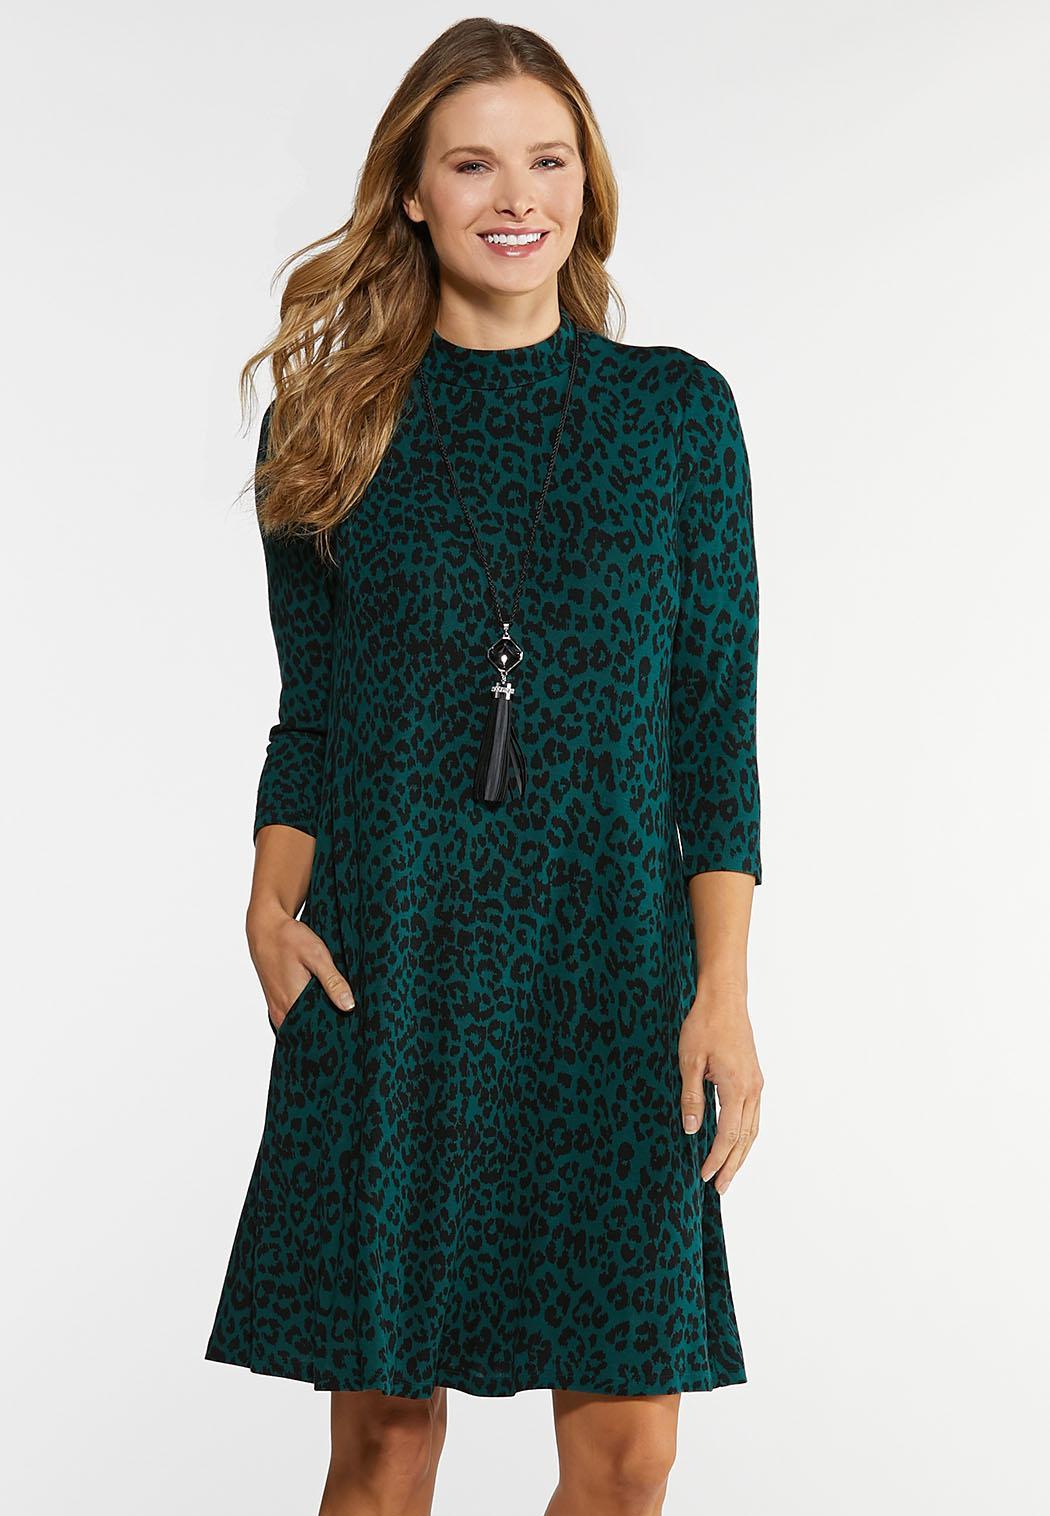 Plus Size Leopard Swing Dress Plus Sizes Cato Fashions